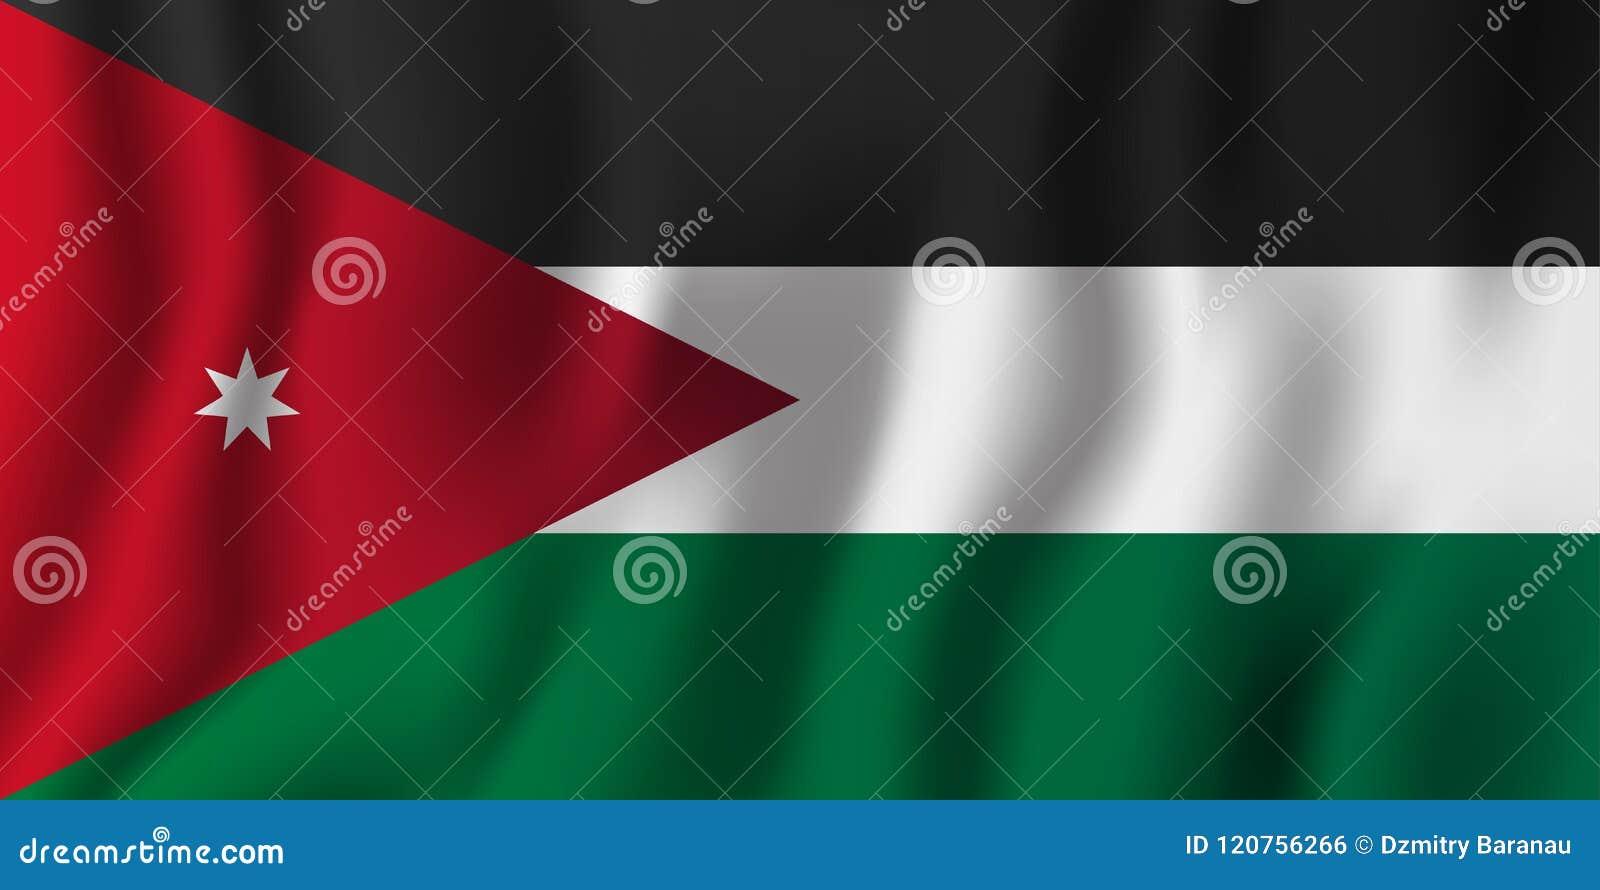 Jordan Realistic Waving Flag Vector Illustration National Country